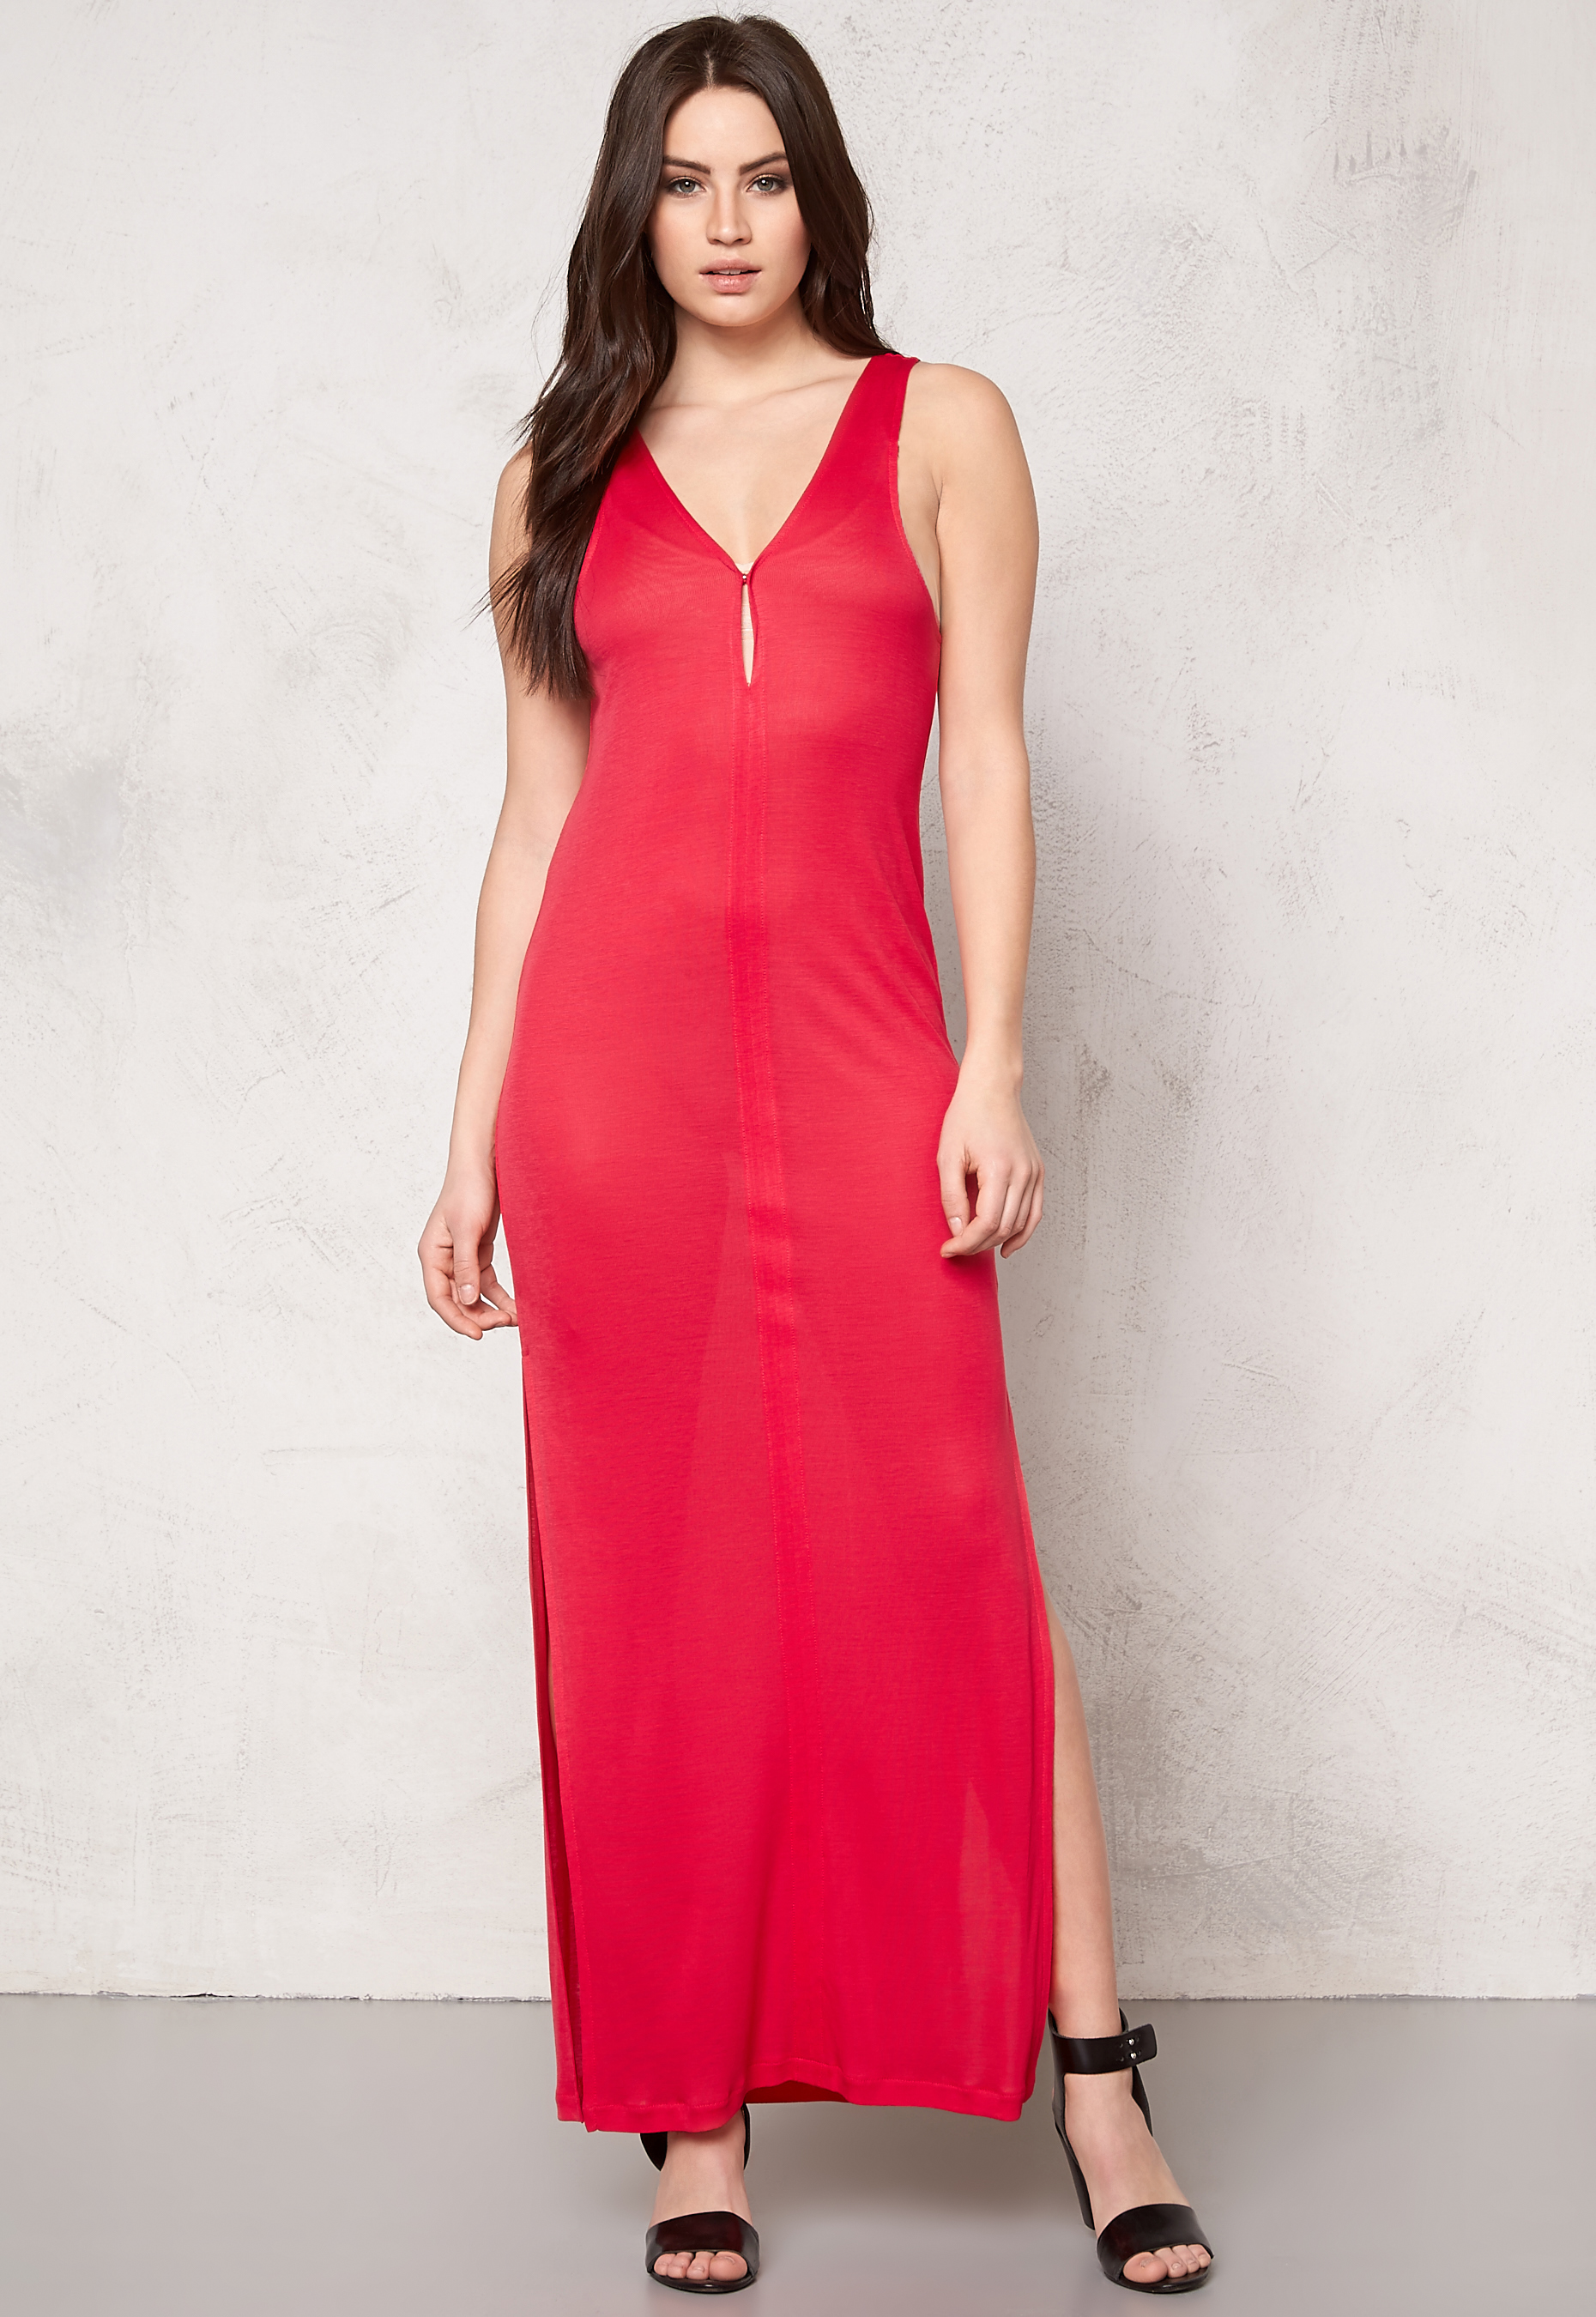 863874554ad6 DAGMAR Inaya Dress 248 Raspberry Red - Bubbleroom